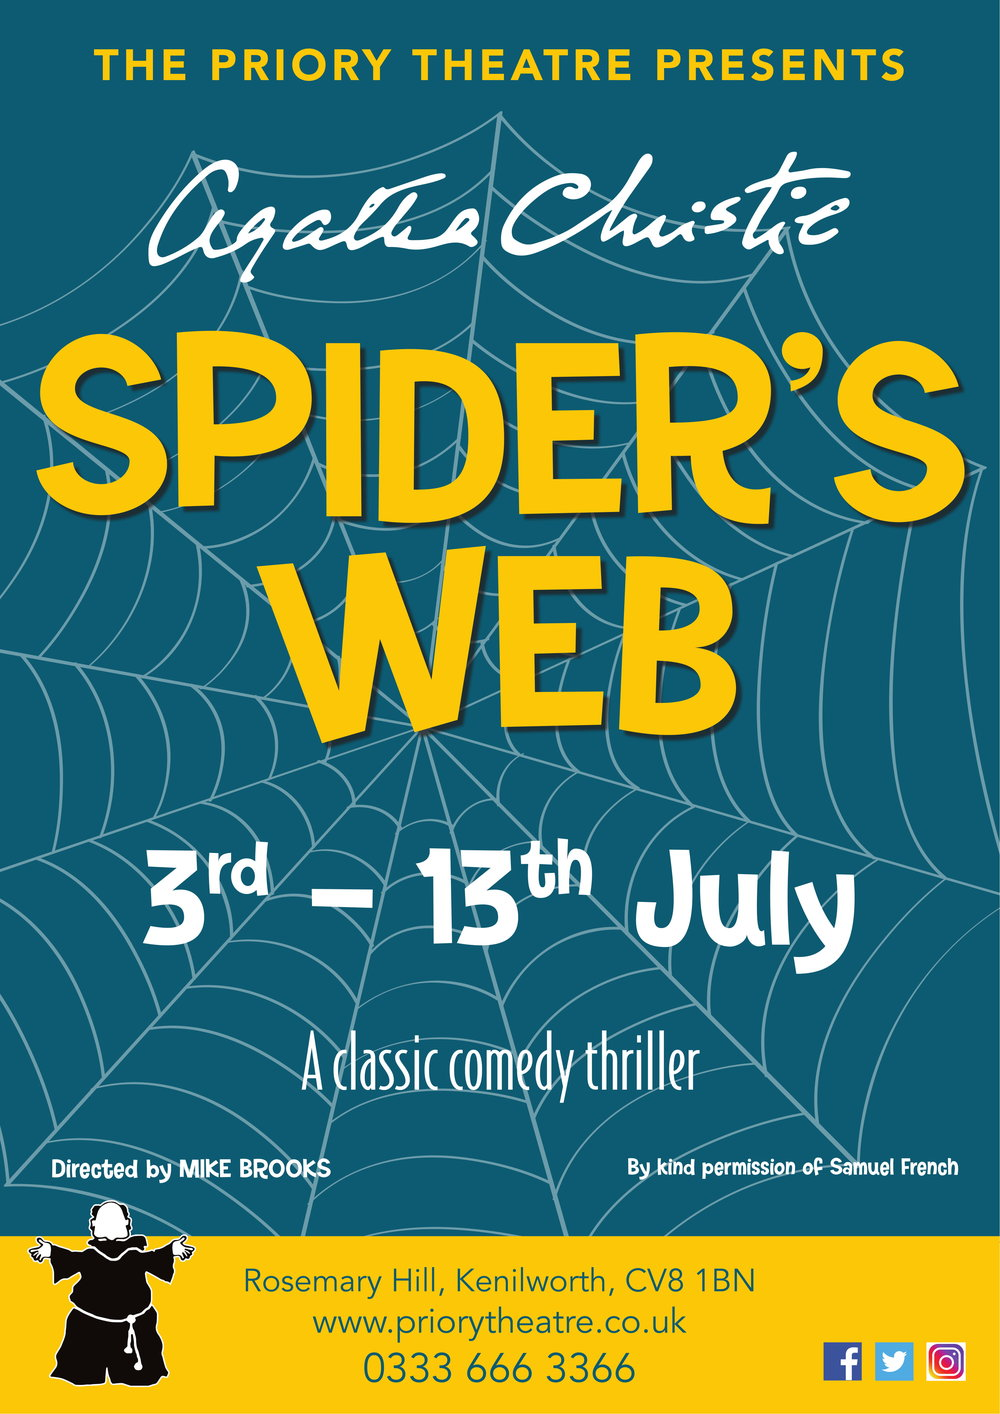 5 Spider's Web Poster-1.jpg